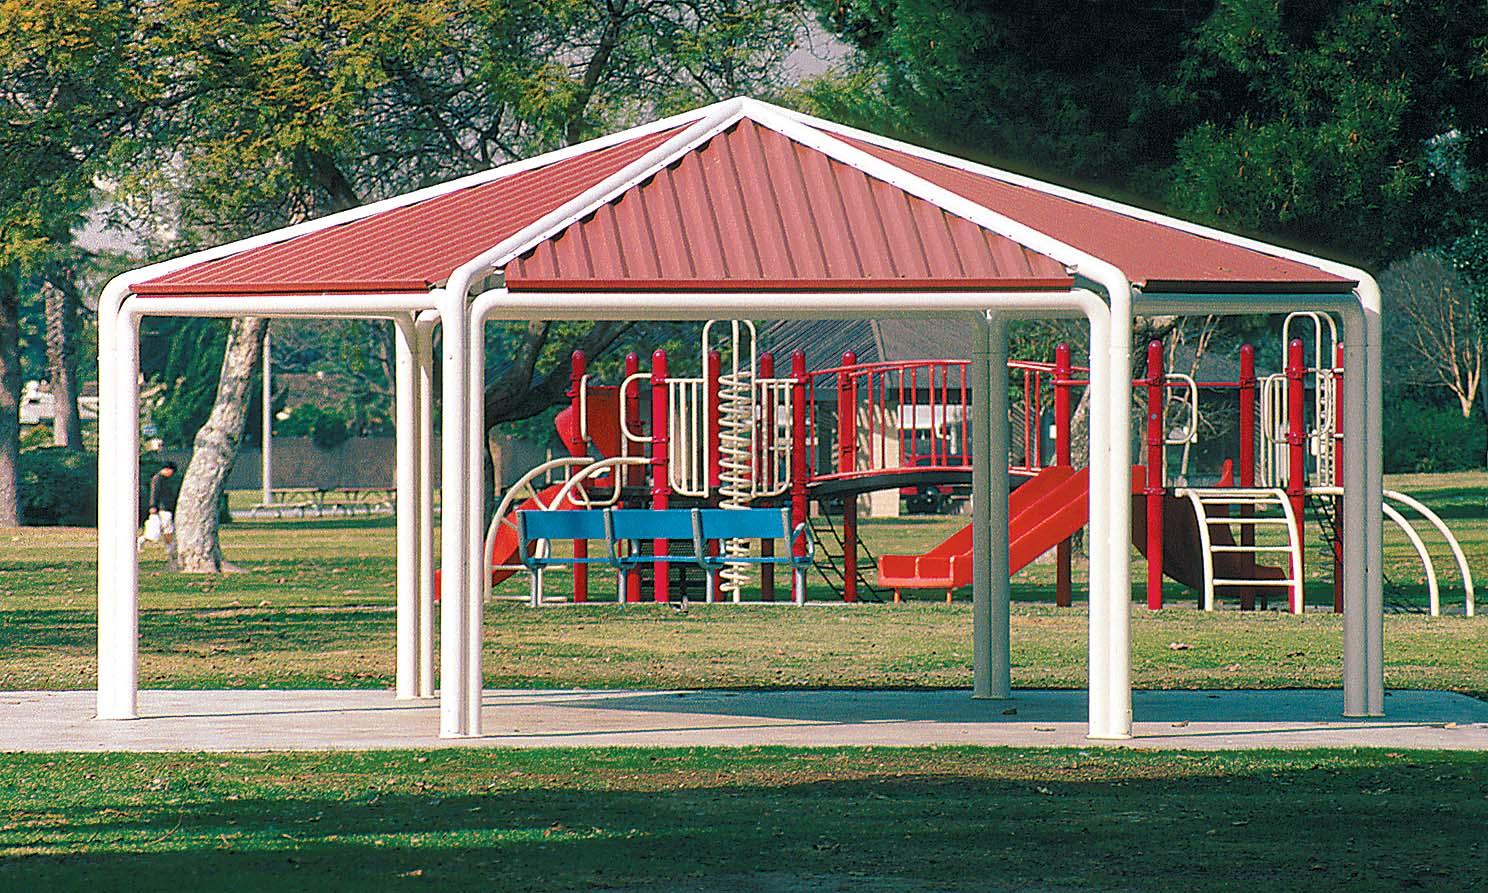 Prescott shade structure